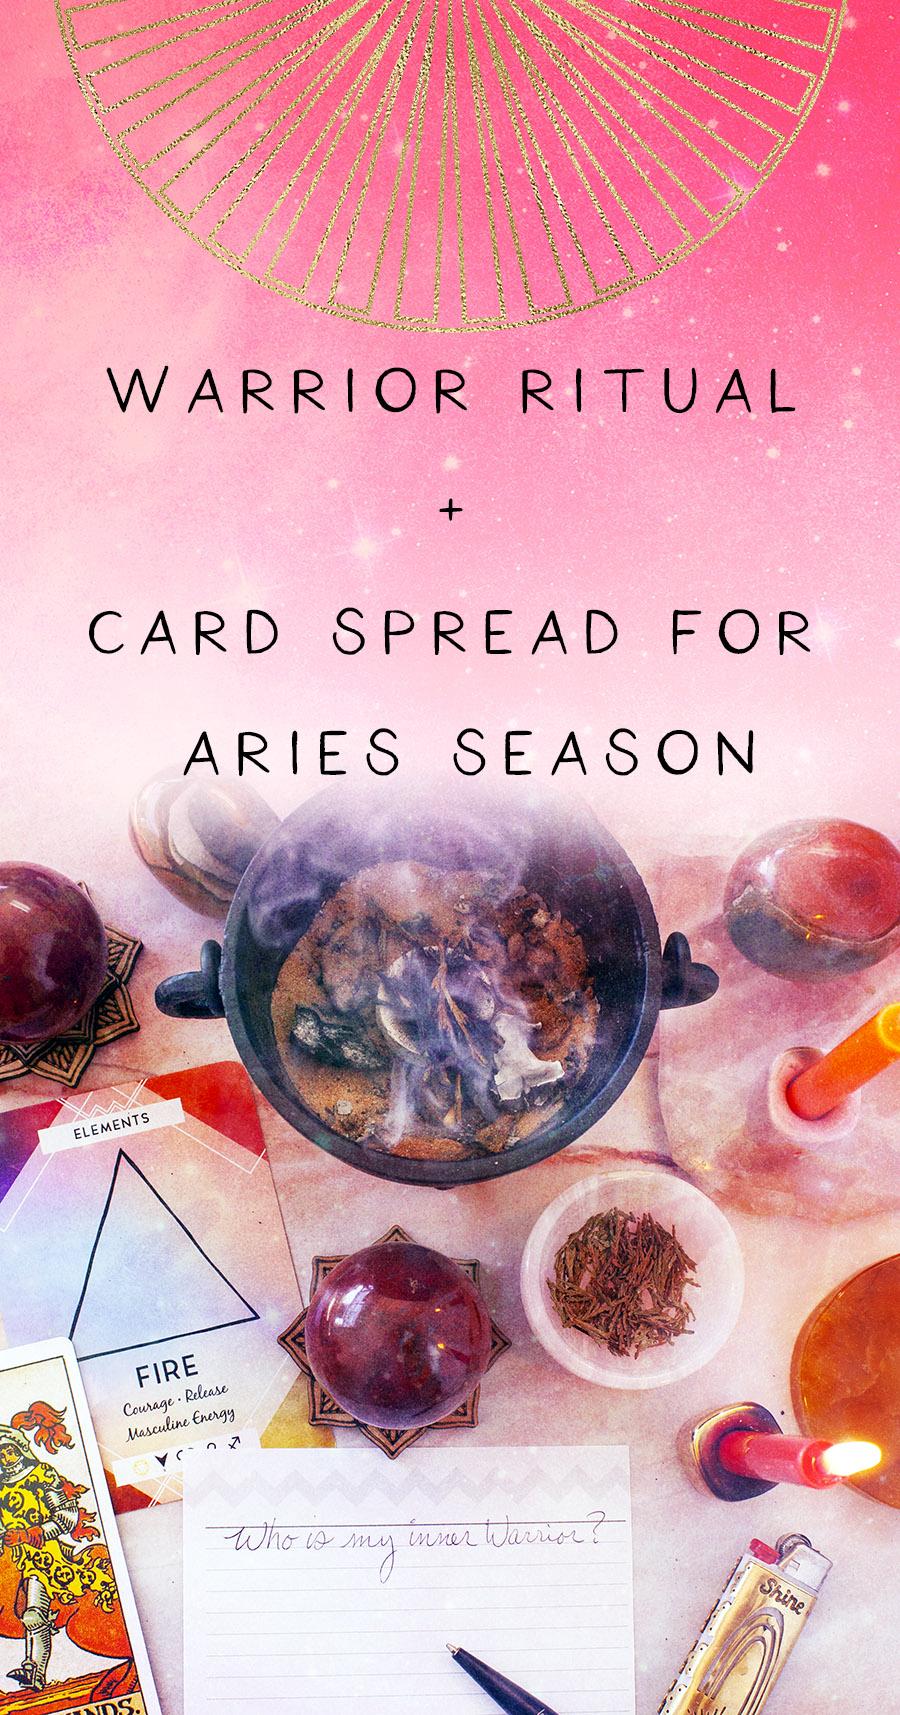 ritual and card spread for aries season warrior ritual